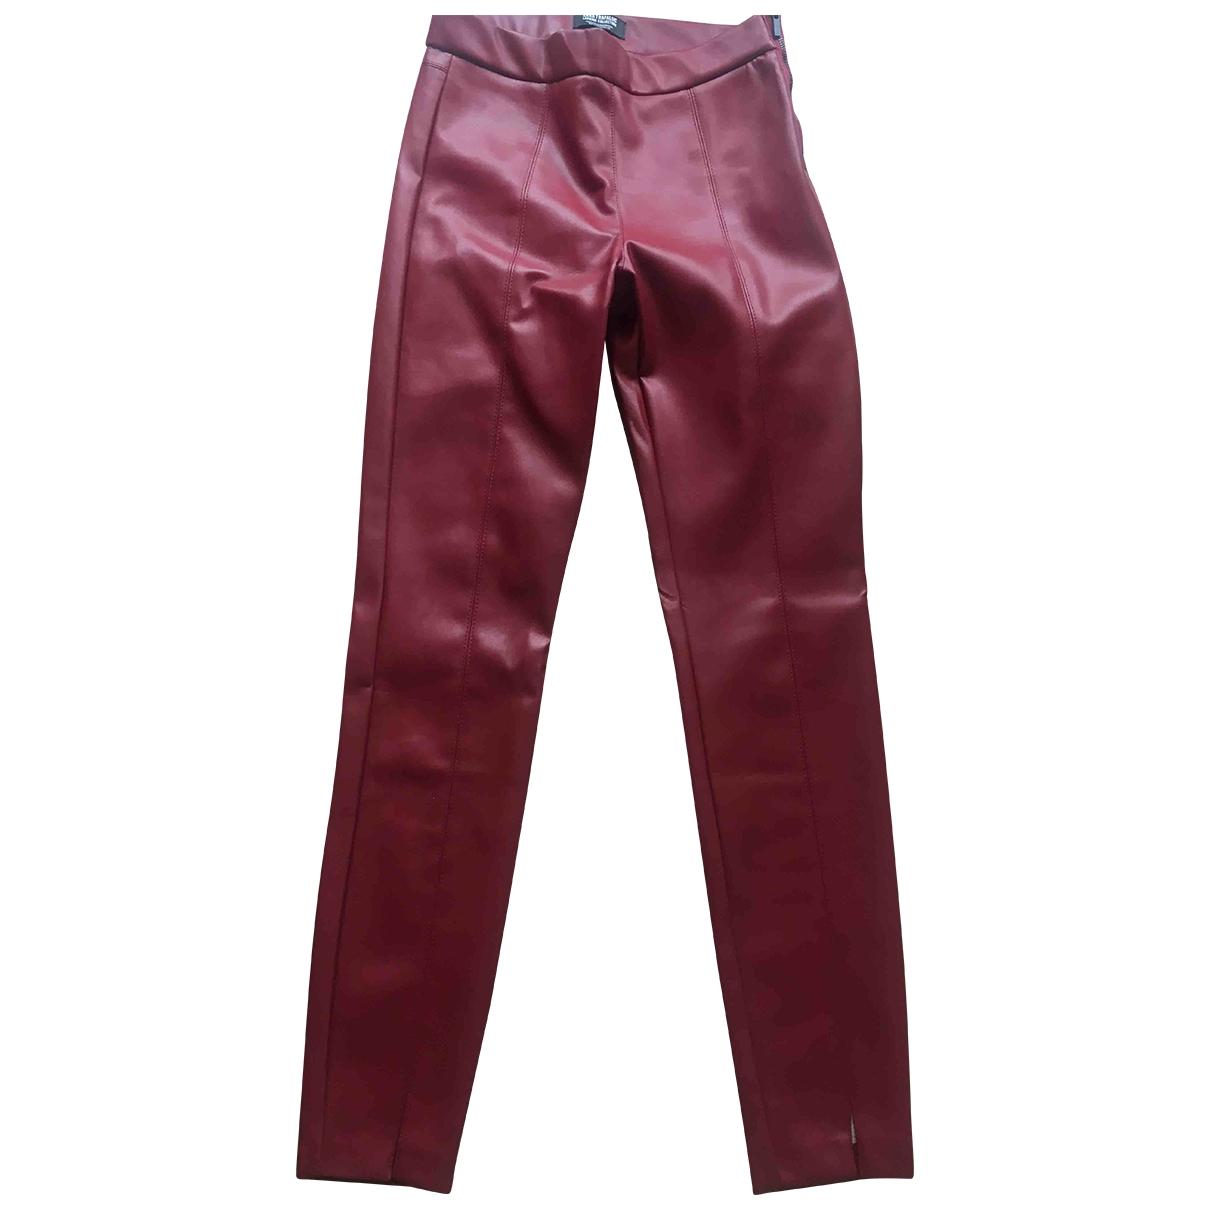 Zara \N Burgundy Trousers for Women S International